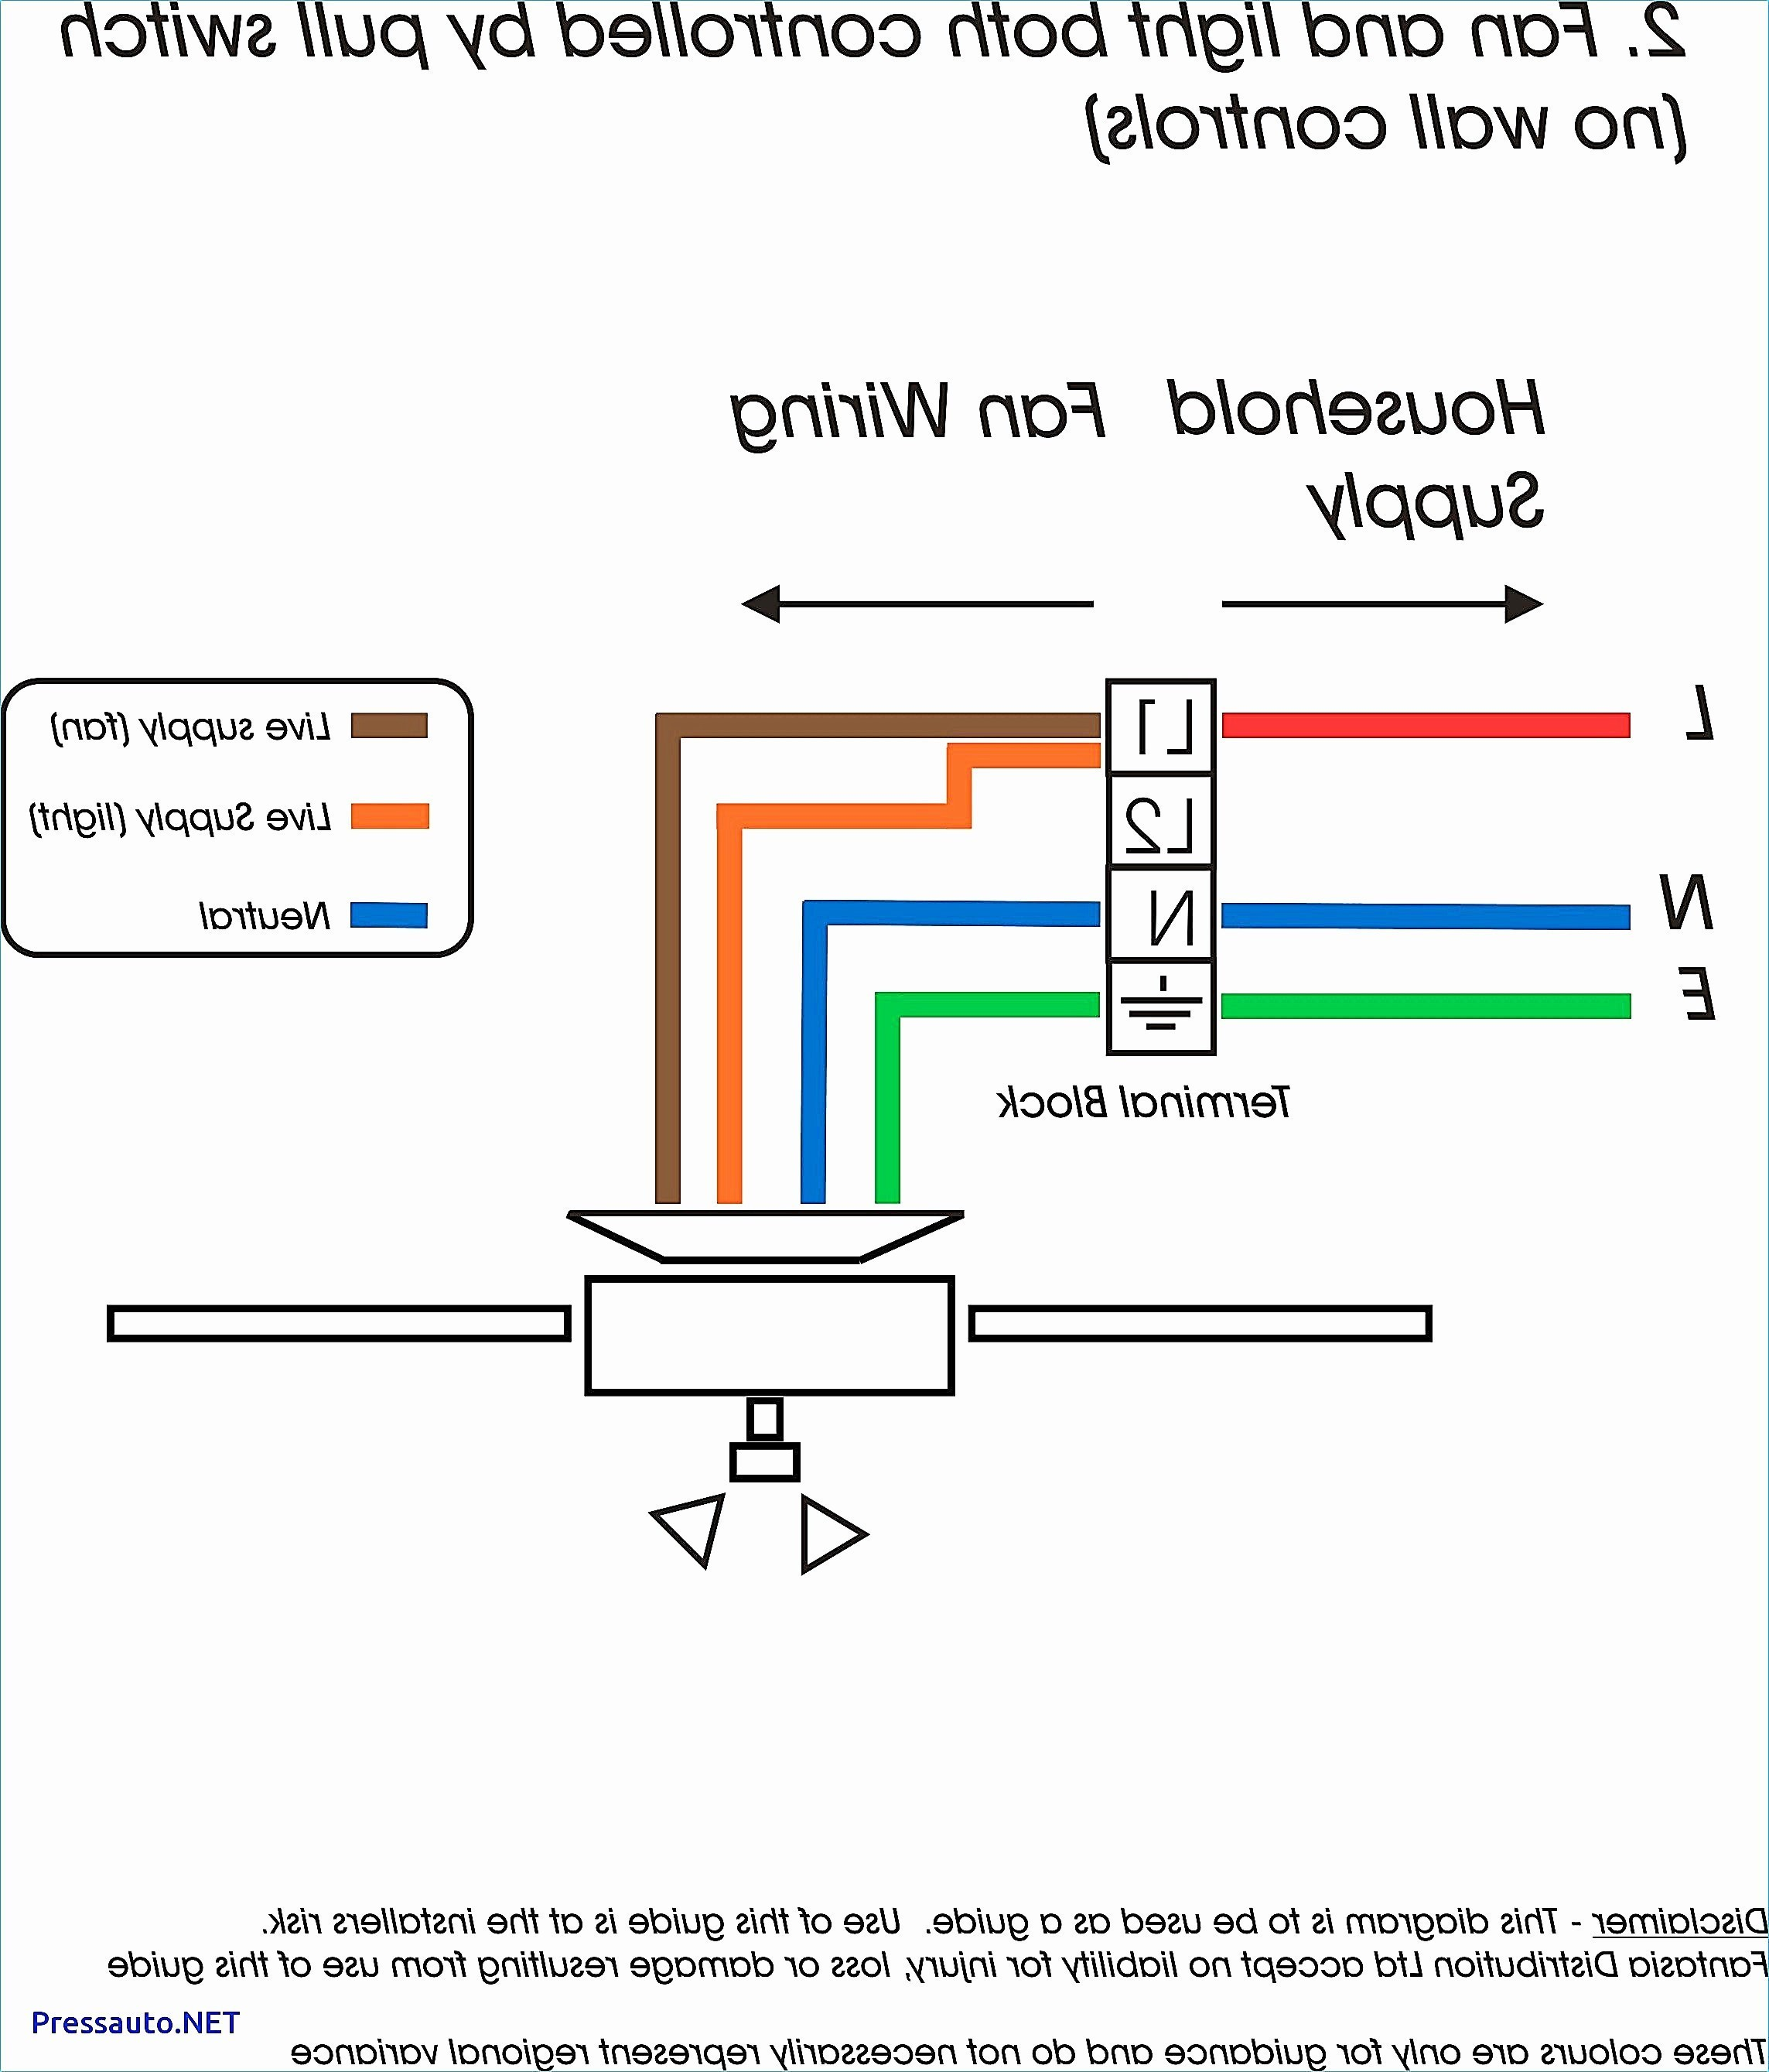 Car Stereo Radio Wiring Diagram Wiring Diagram Car Audio Amplifier Valid Car Audio Wiring Diagrams Of Car Stereo Radio Wiring Diagram